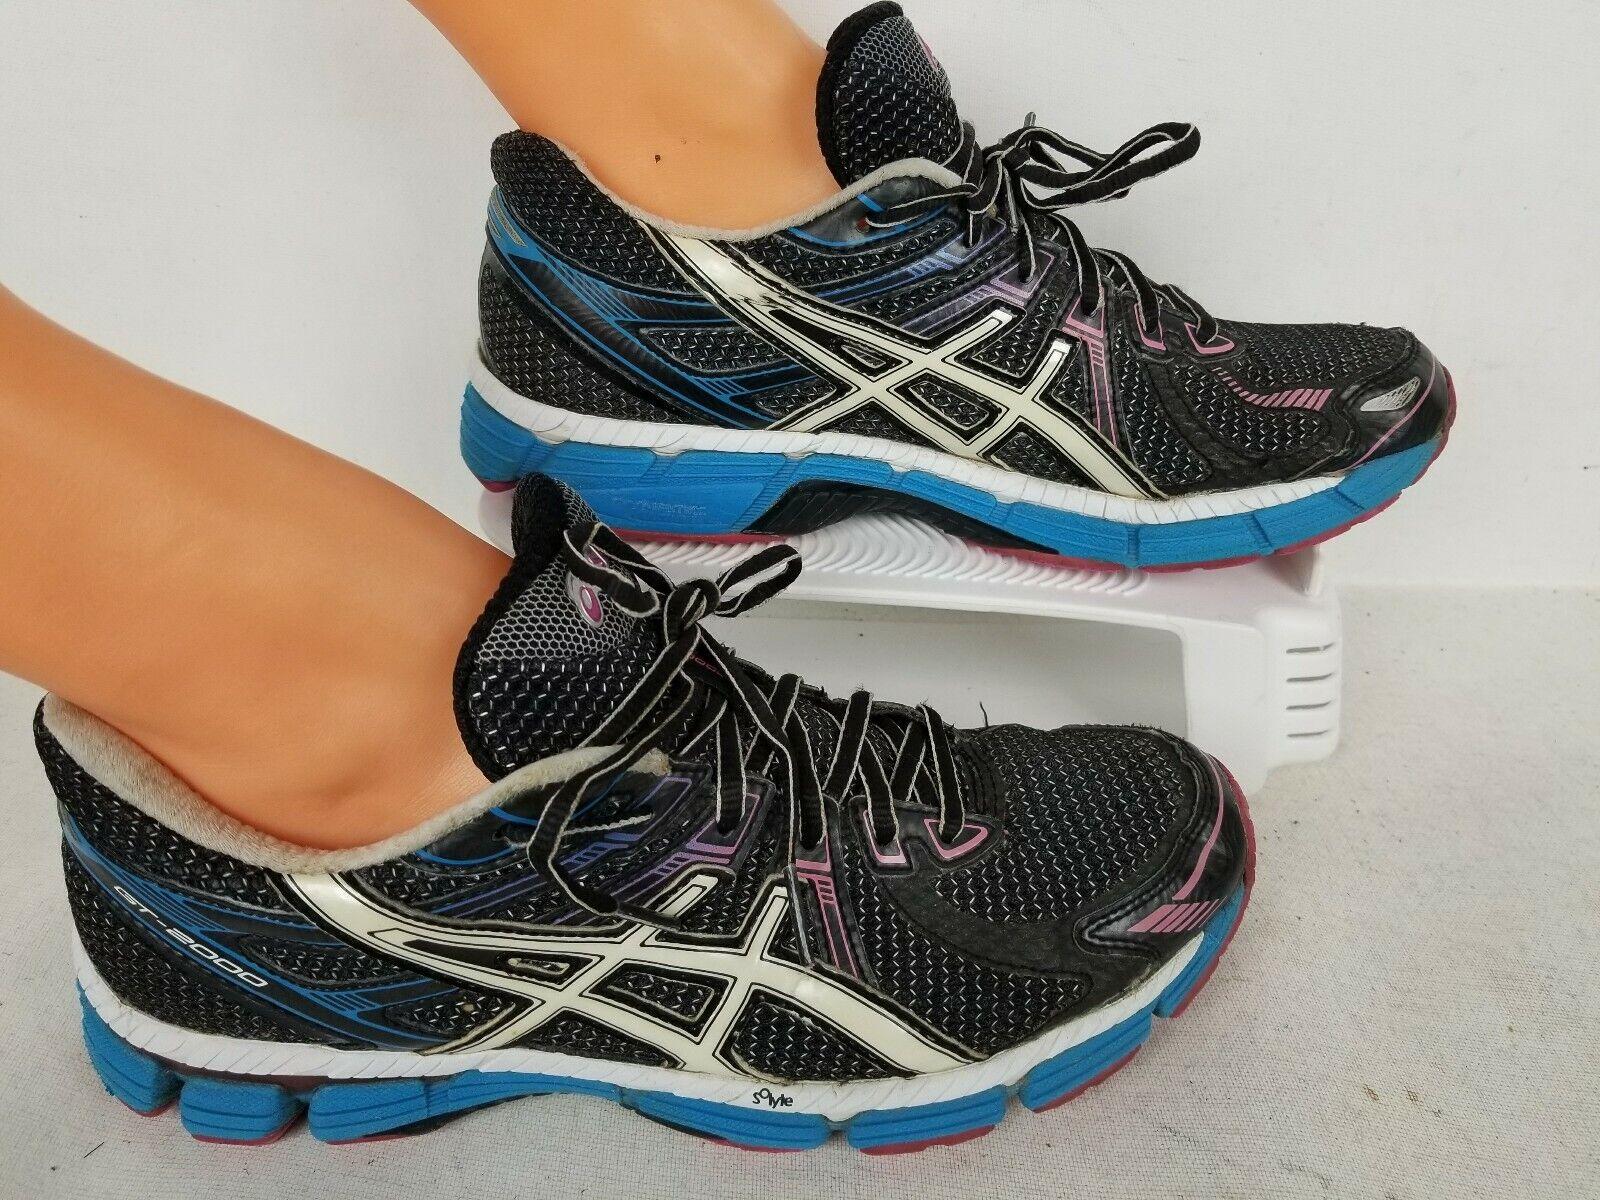 ASICS GT-2000 GYM RUNNING TRANING WALKING SHOES SNEAKERS WOMEN'S SIZE 9.5